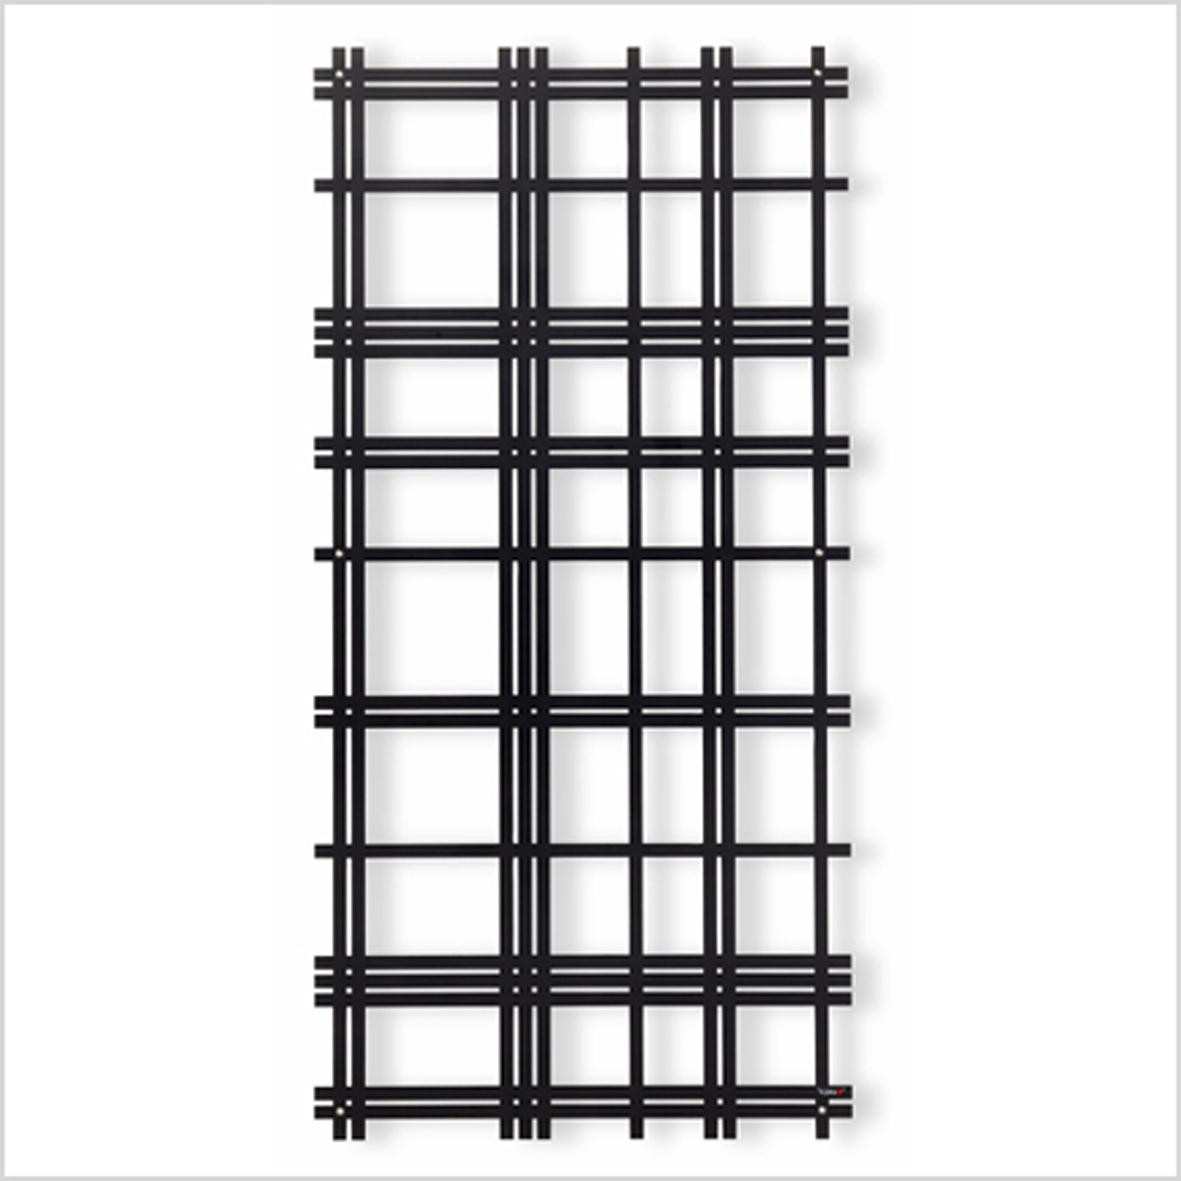 rosen rankhilfe aus metall pn54 kyushucon. Black Bedroom Furniture Sets. Home Design Ideas